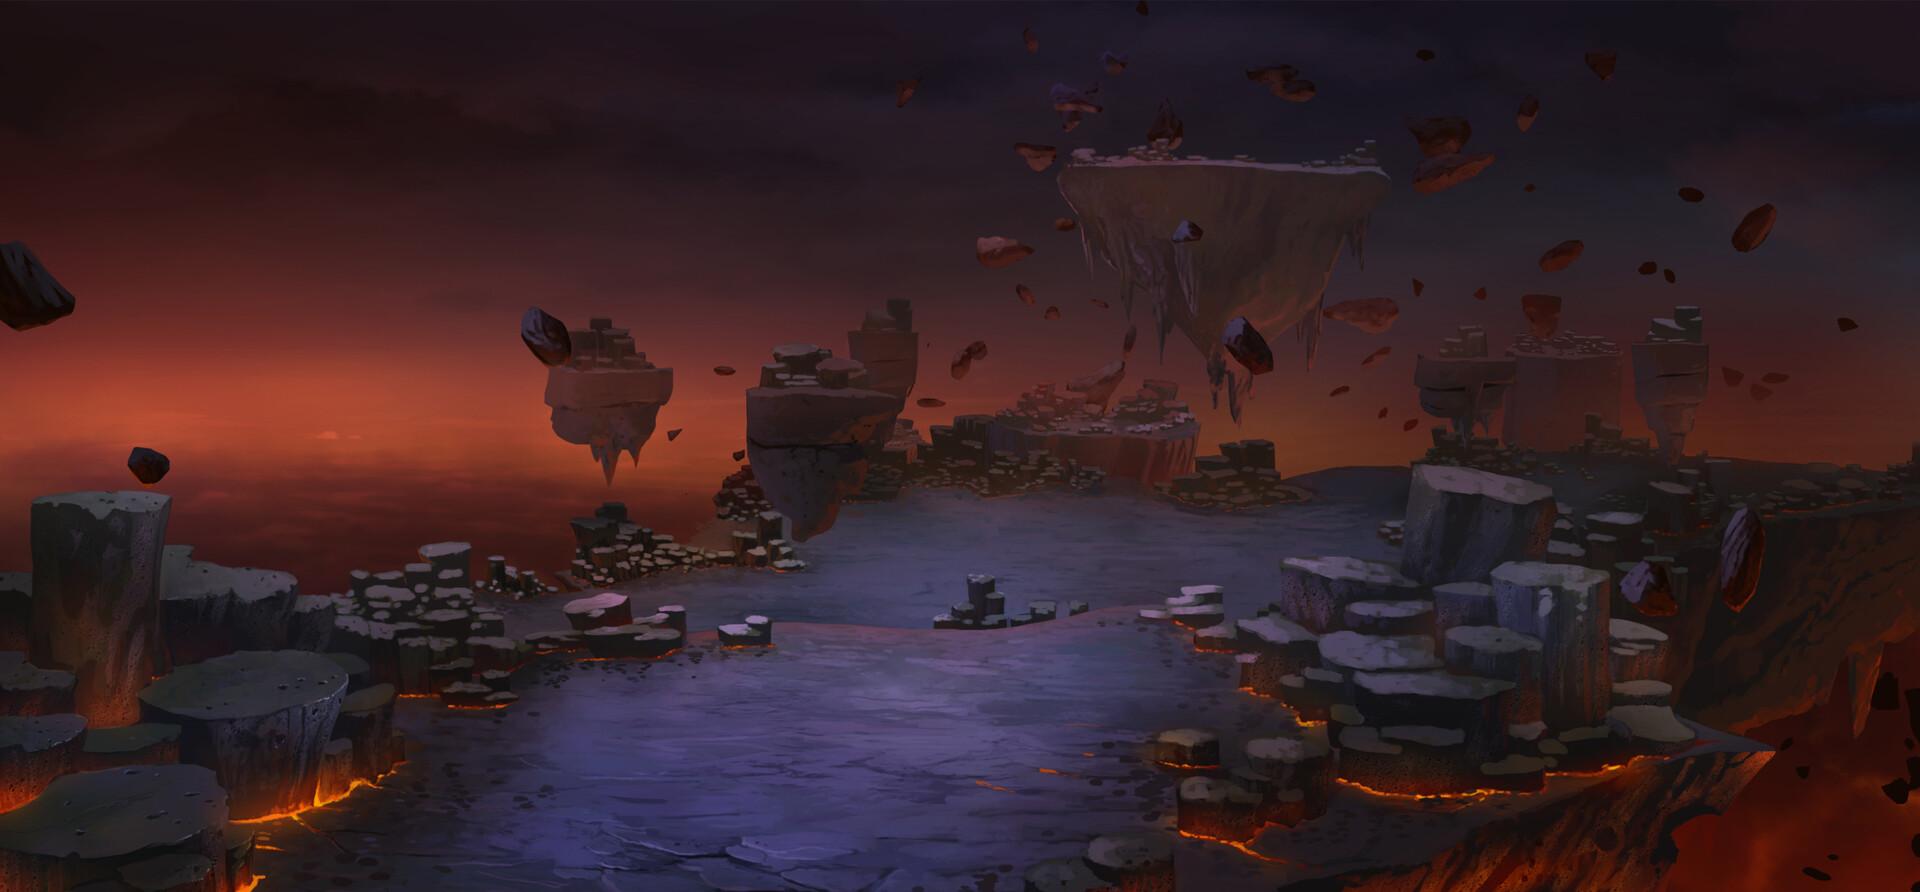 Underworld (Skylanders Academy)